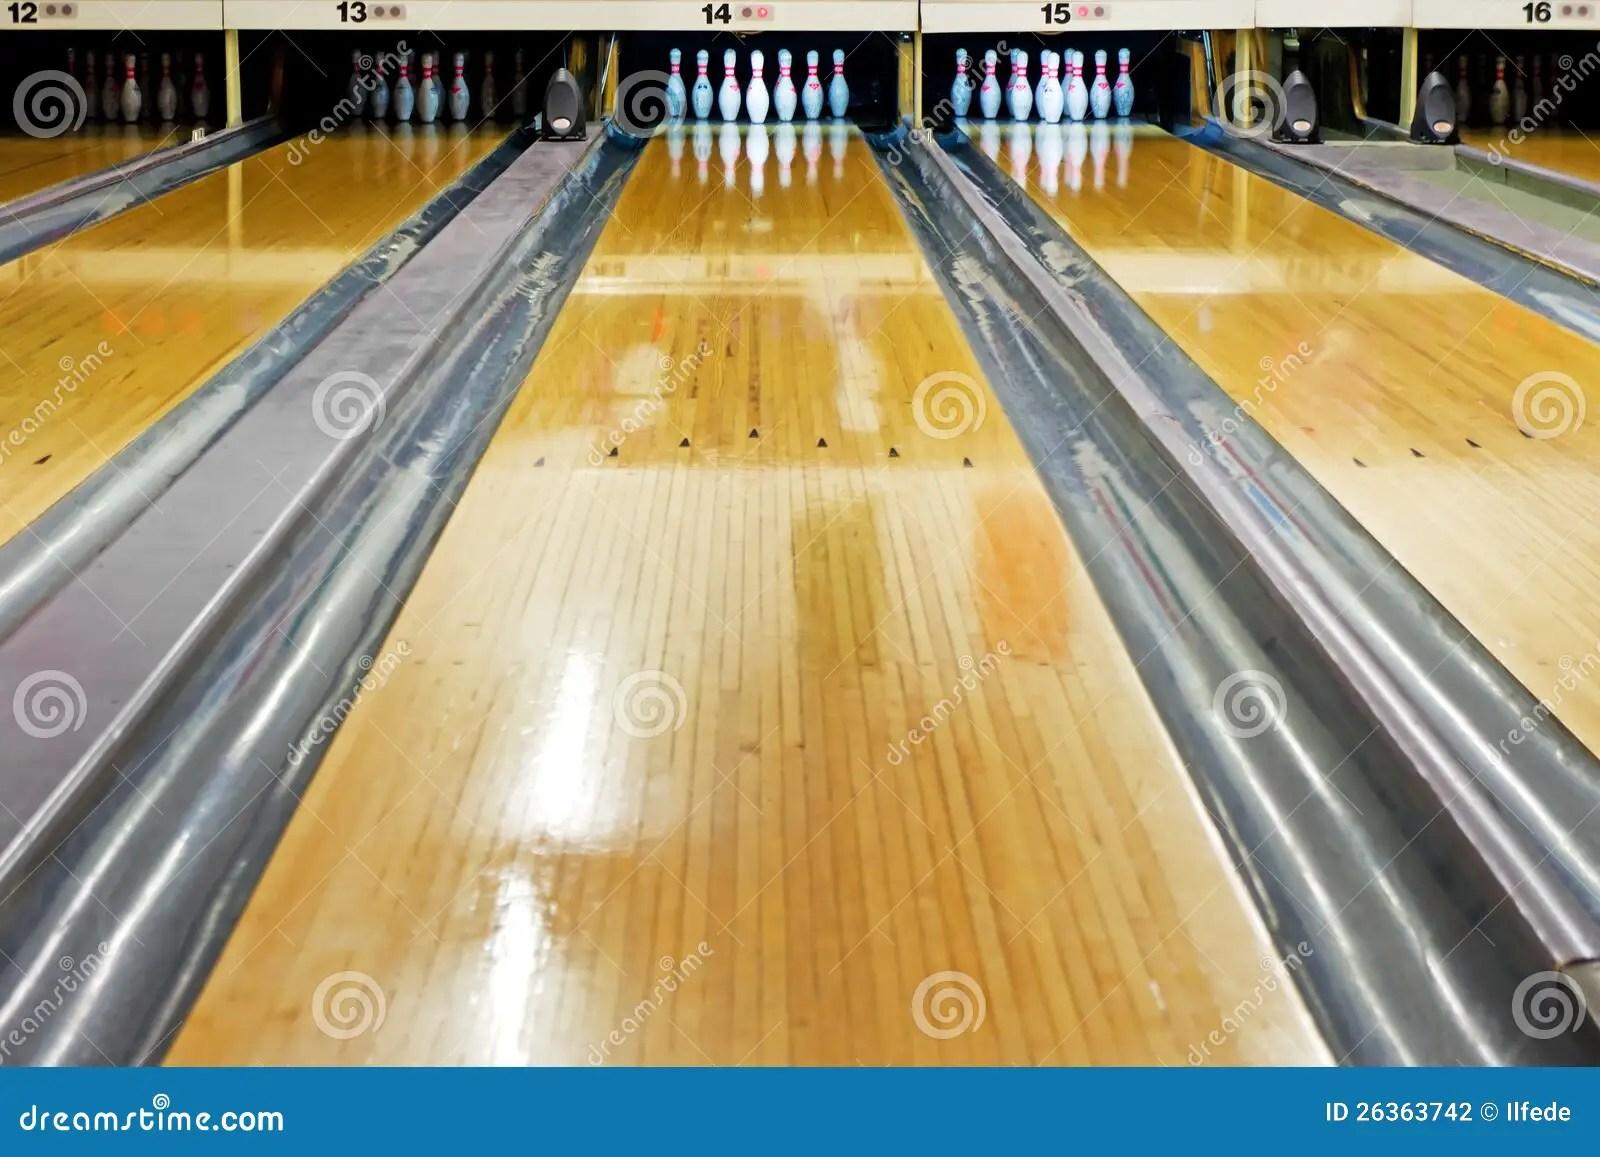 hight resolution of bowling lane